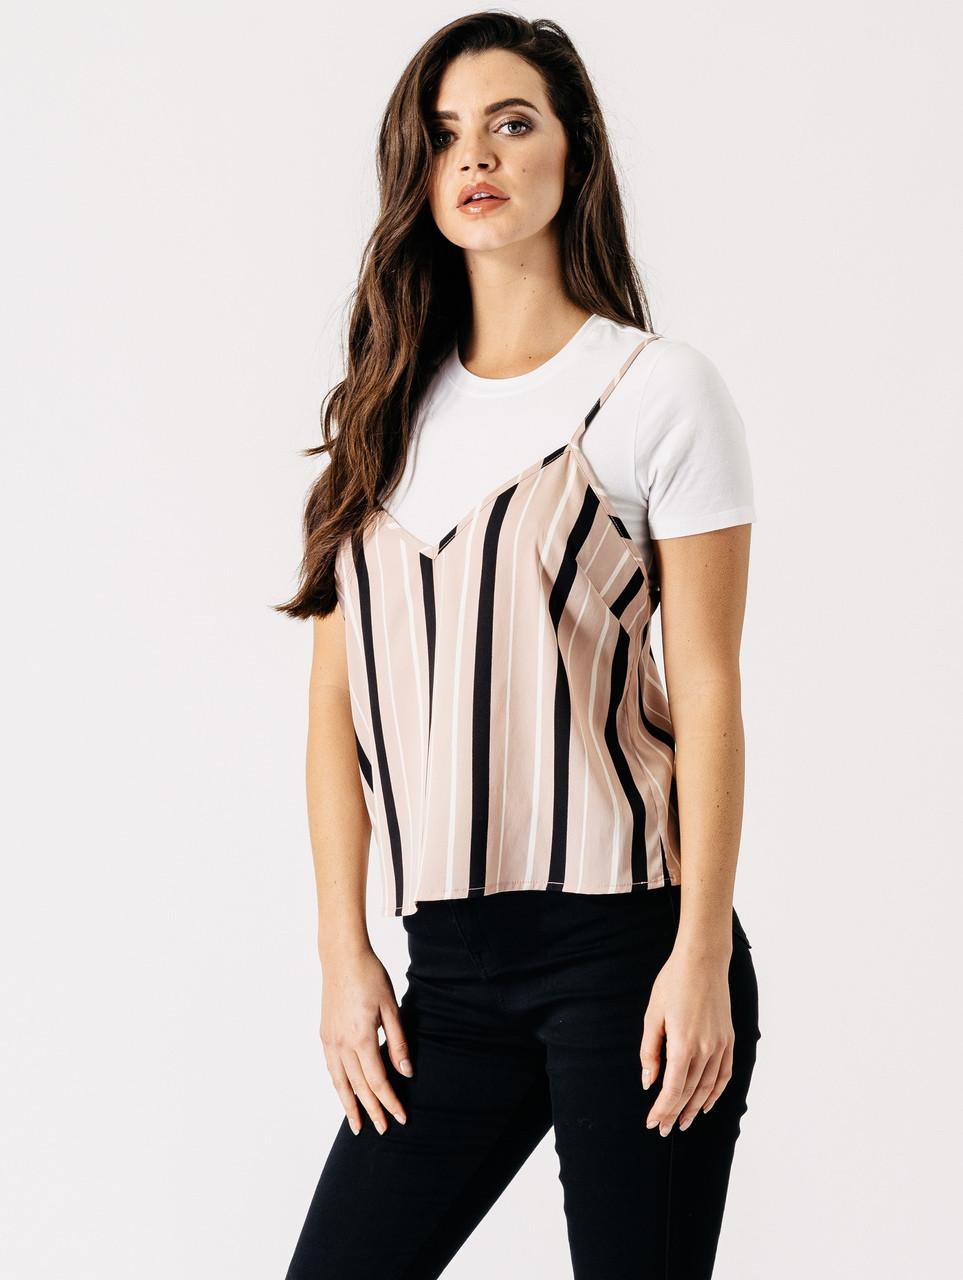 Pink Stripe Print 2 in 1 Top